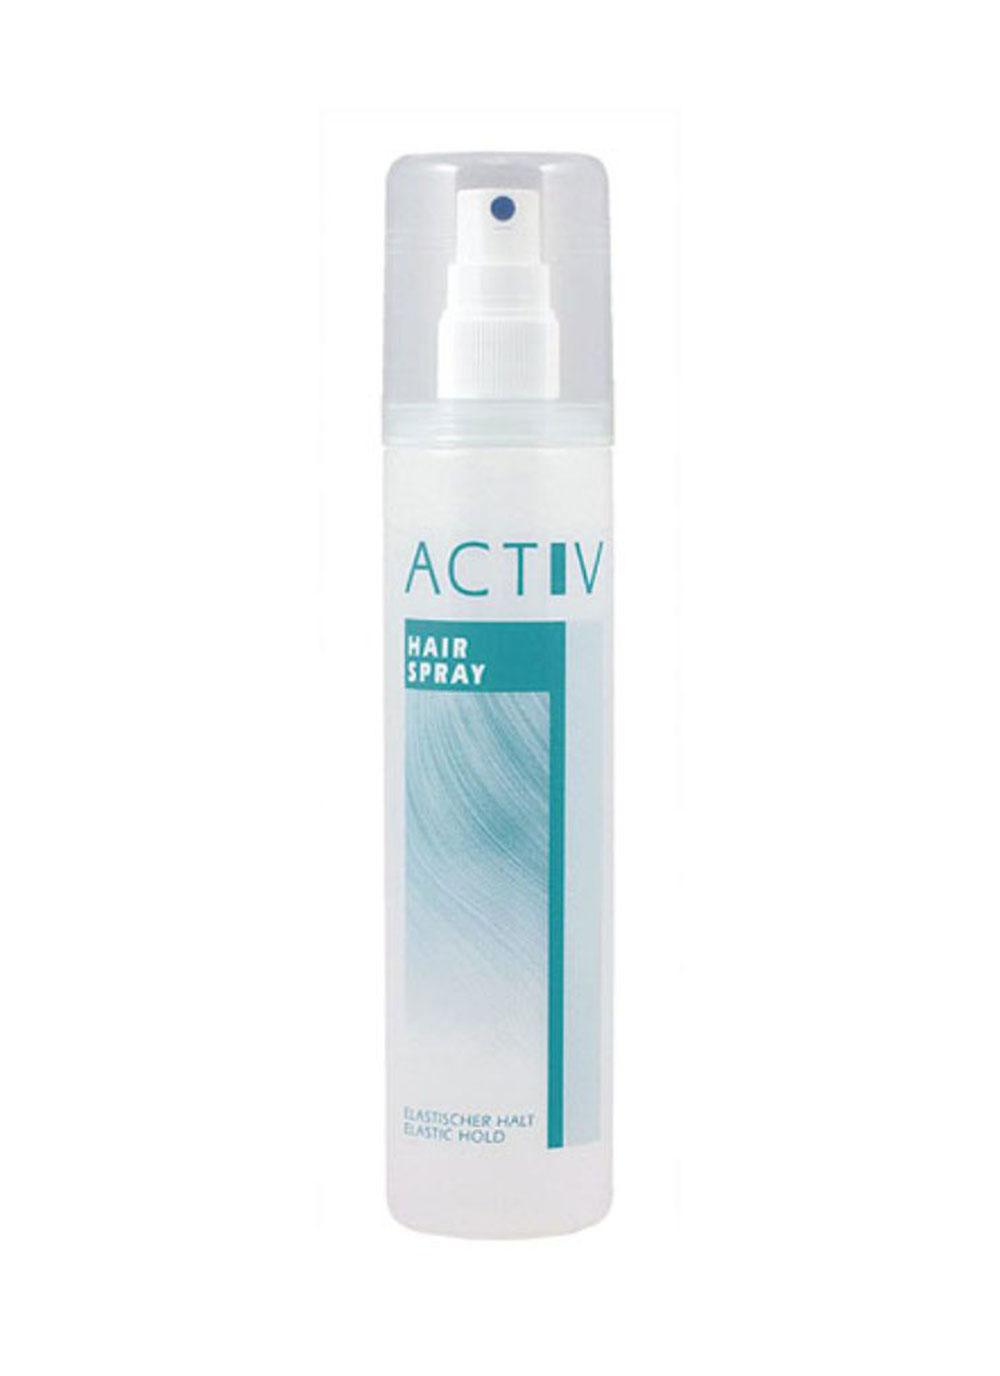 GFH Zubehör - Activ Hairspray 200ml